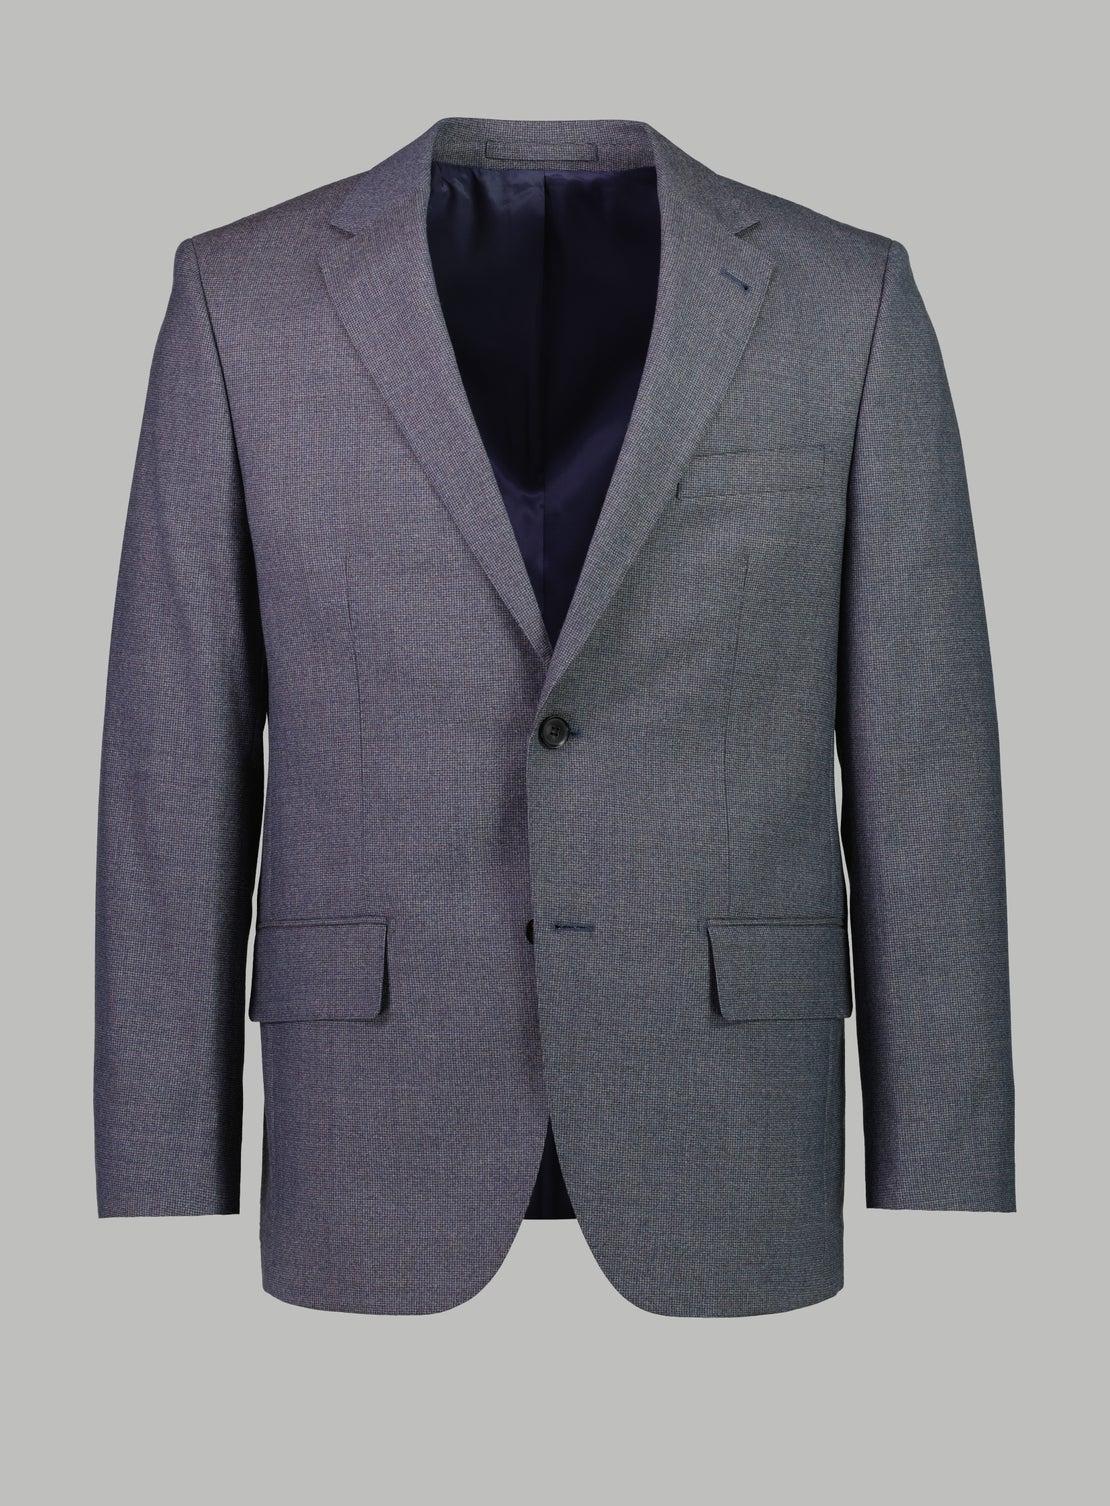 Gael Blue Puppytooth Suit